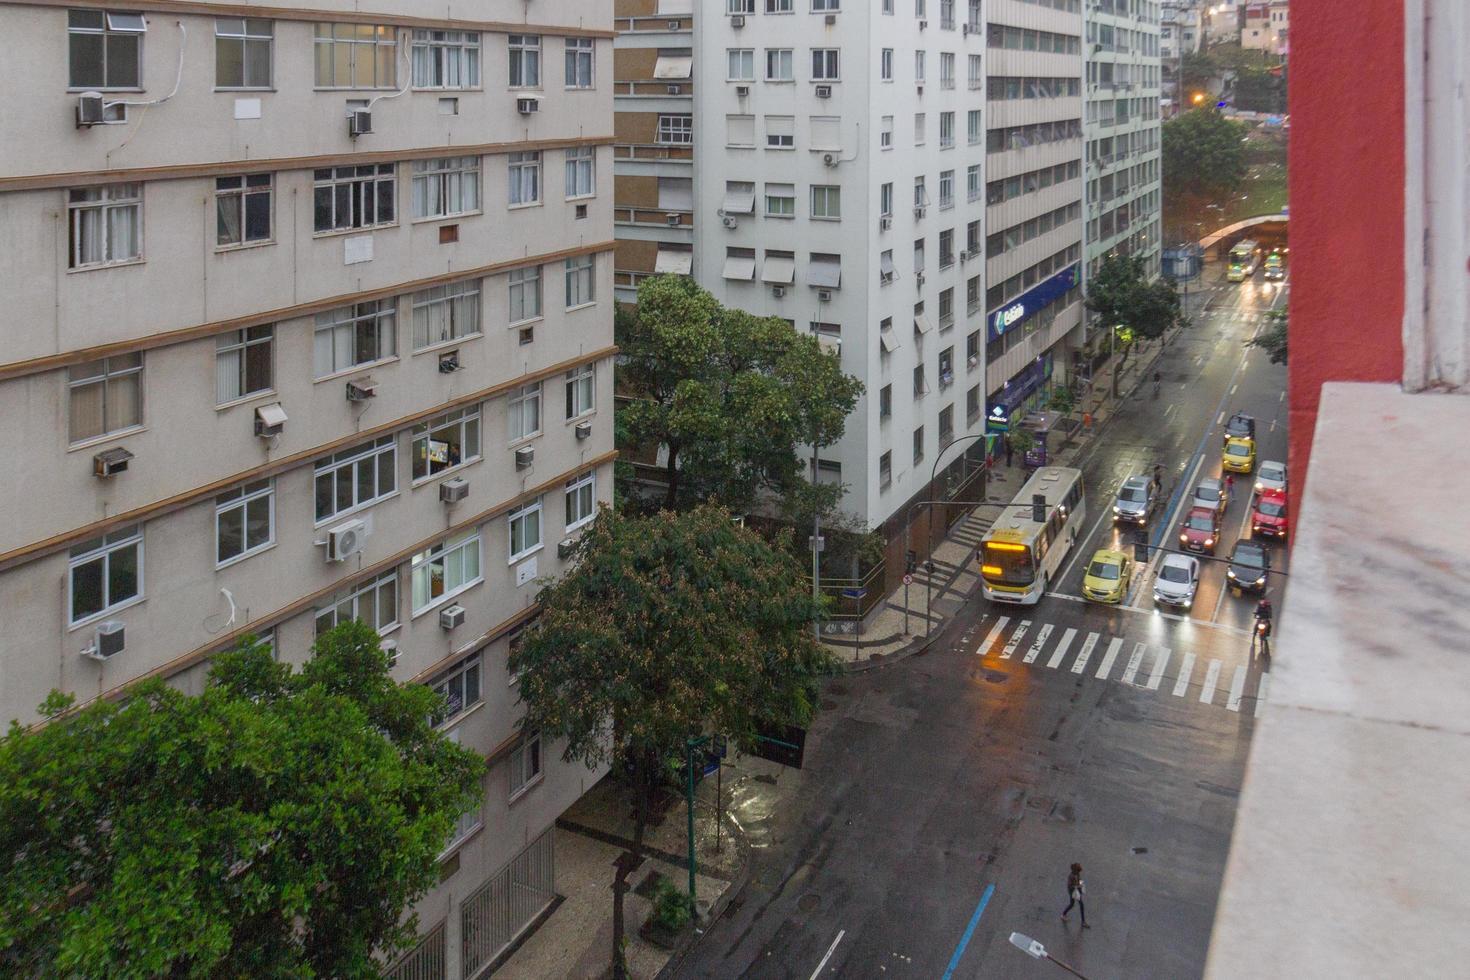 río de janeiro, brasil, 2015 - vista del barrio de copacabana foto